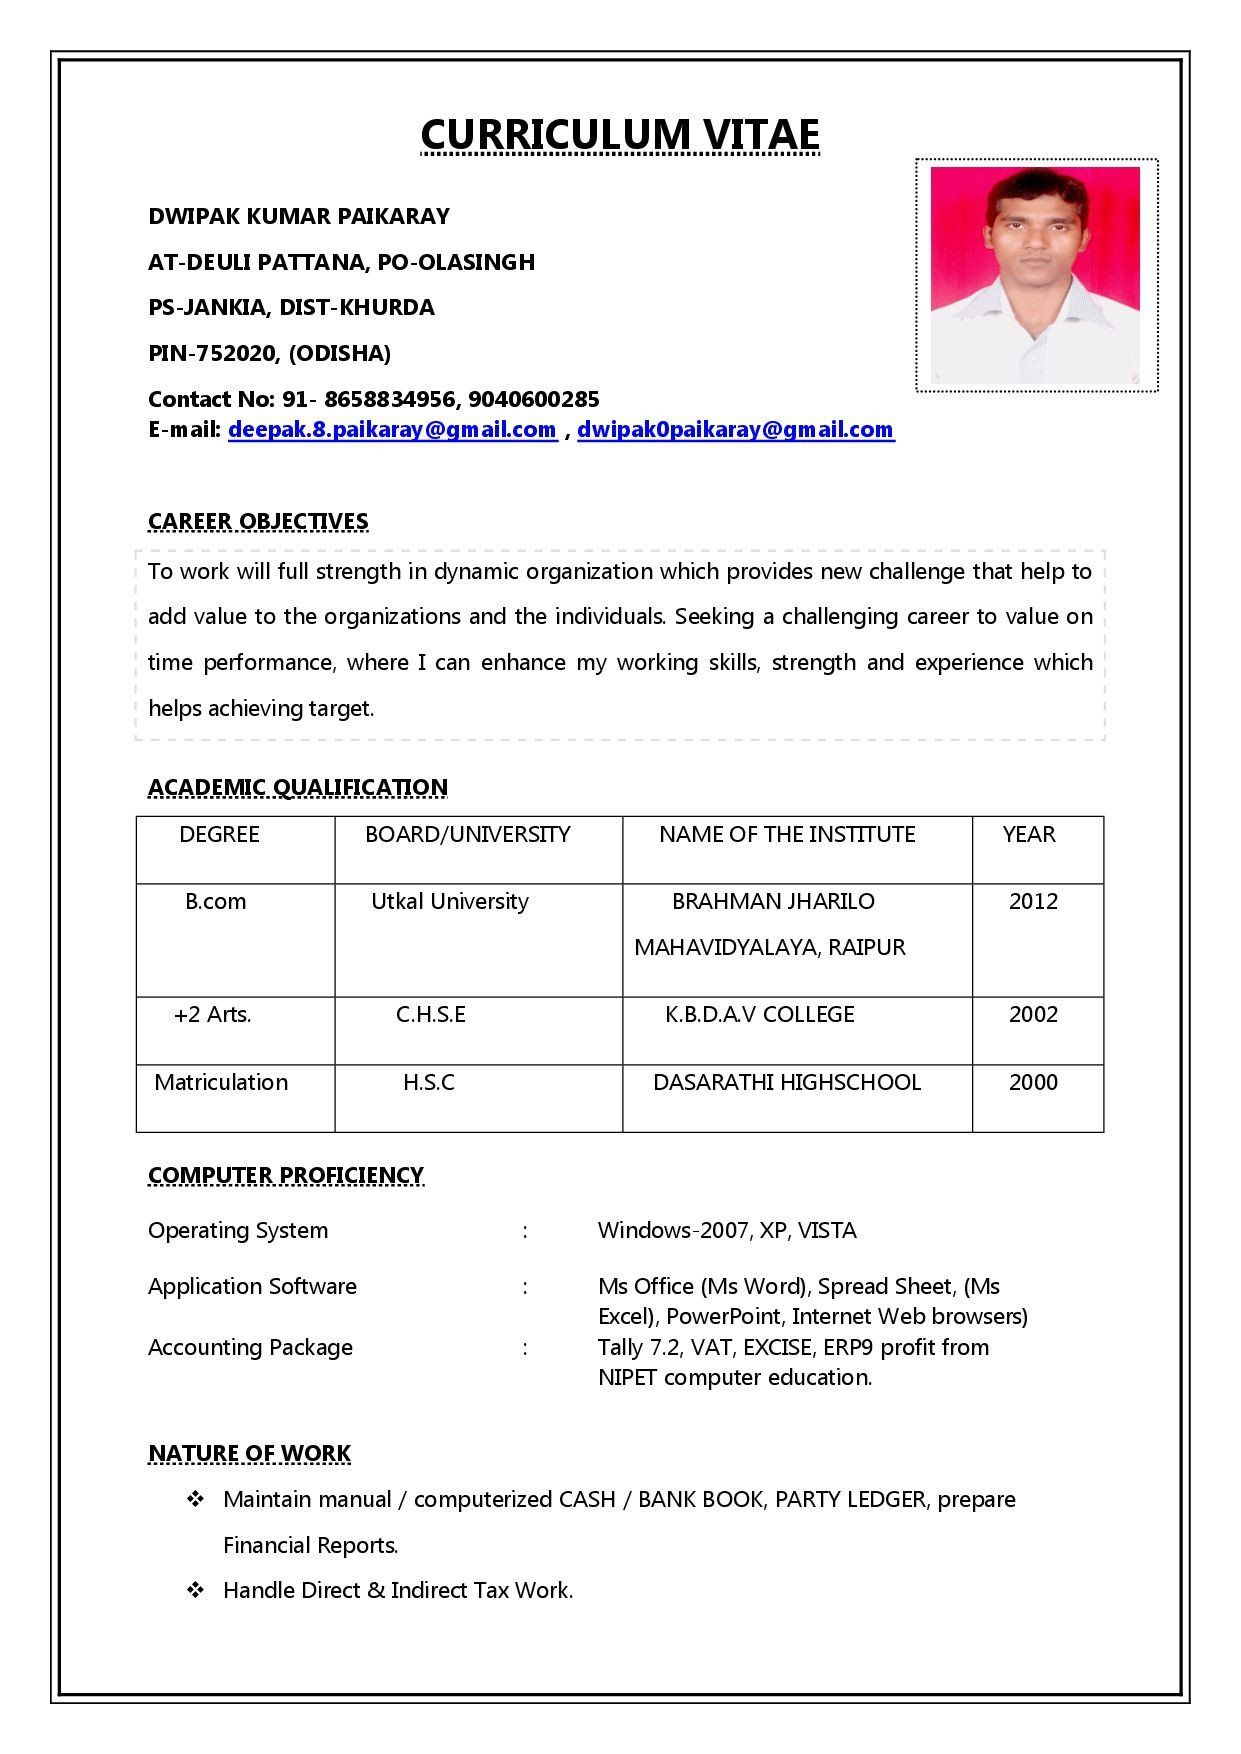 Cv Format Download Job 3 Resume Format In 2020 Job Resume Job Resume Format Sample Resume Format